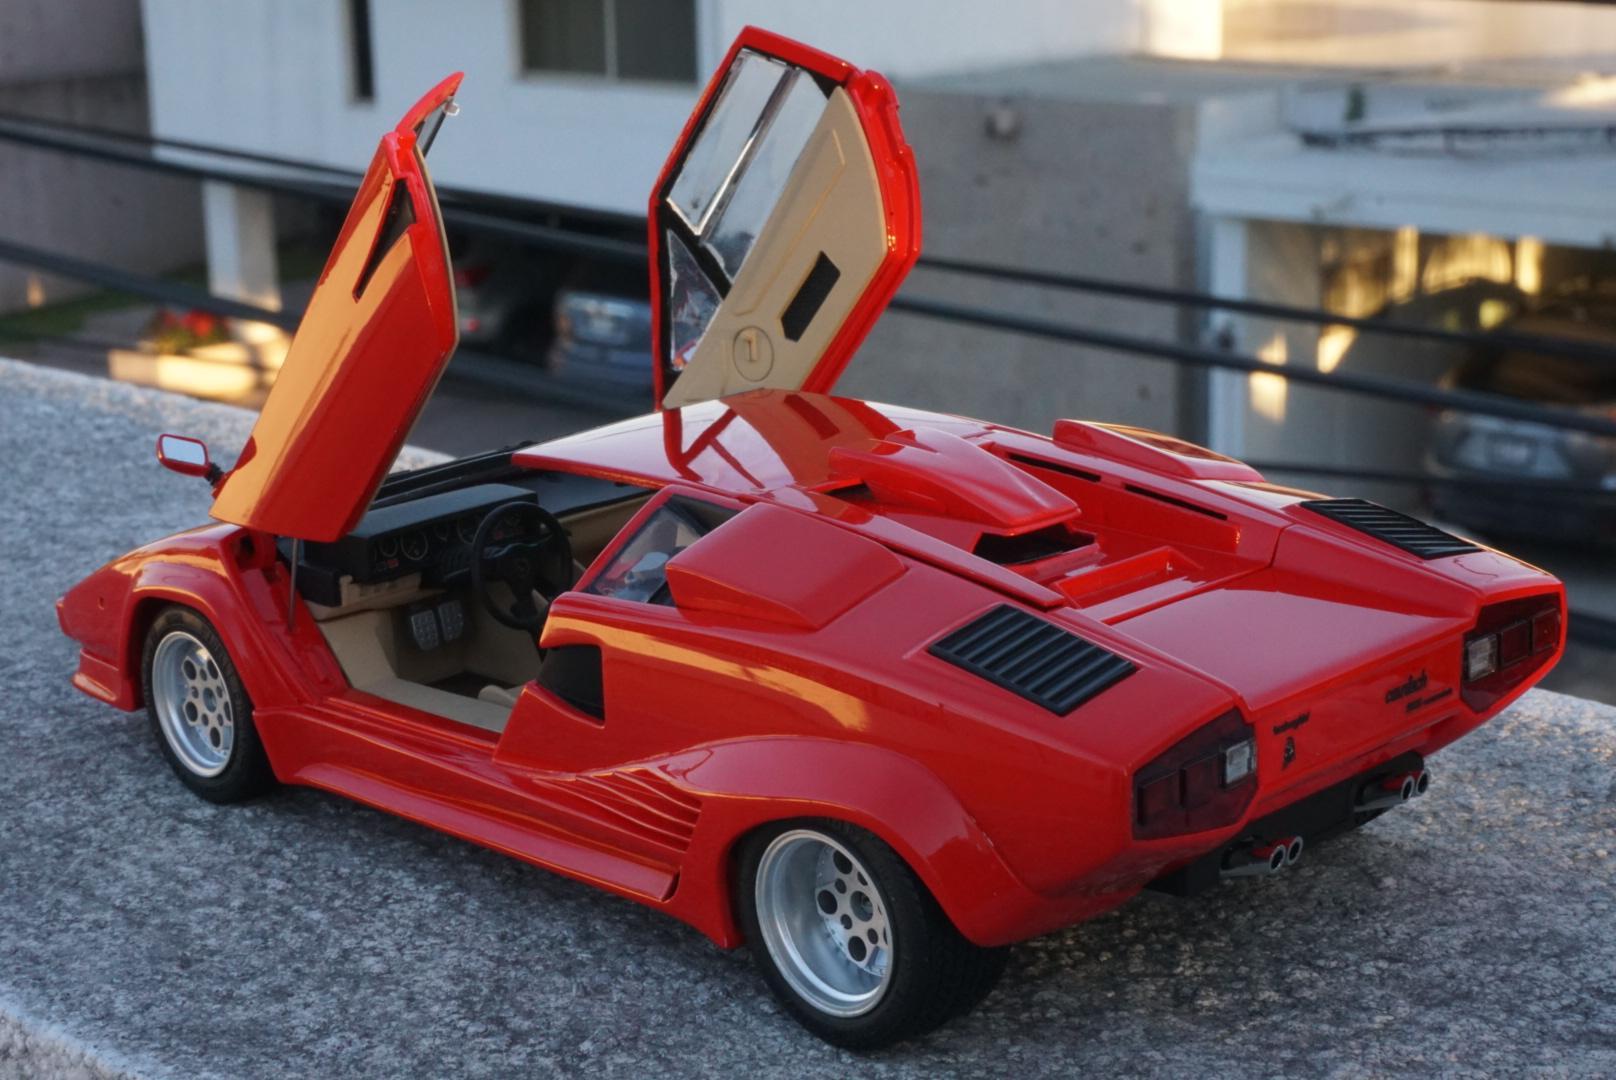 lamborghini countach 5000 quattrovalvole under glass model cars magazine forum. Black Bedroom Furniture Sets. Home Design Ideas